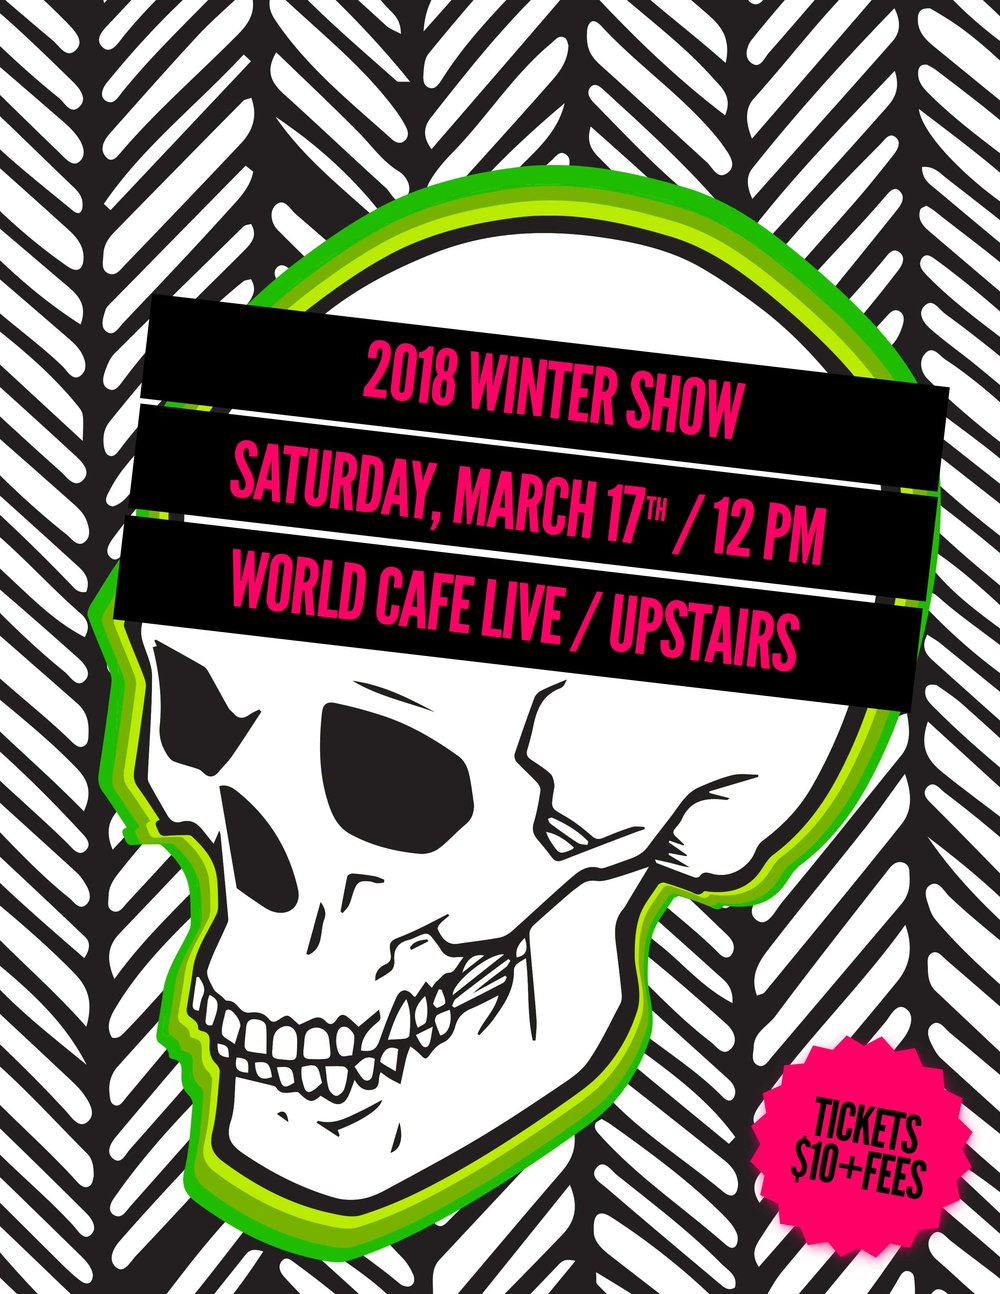 Winter_Poster_2018.jpg